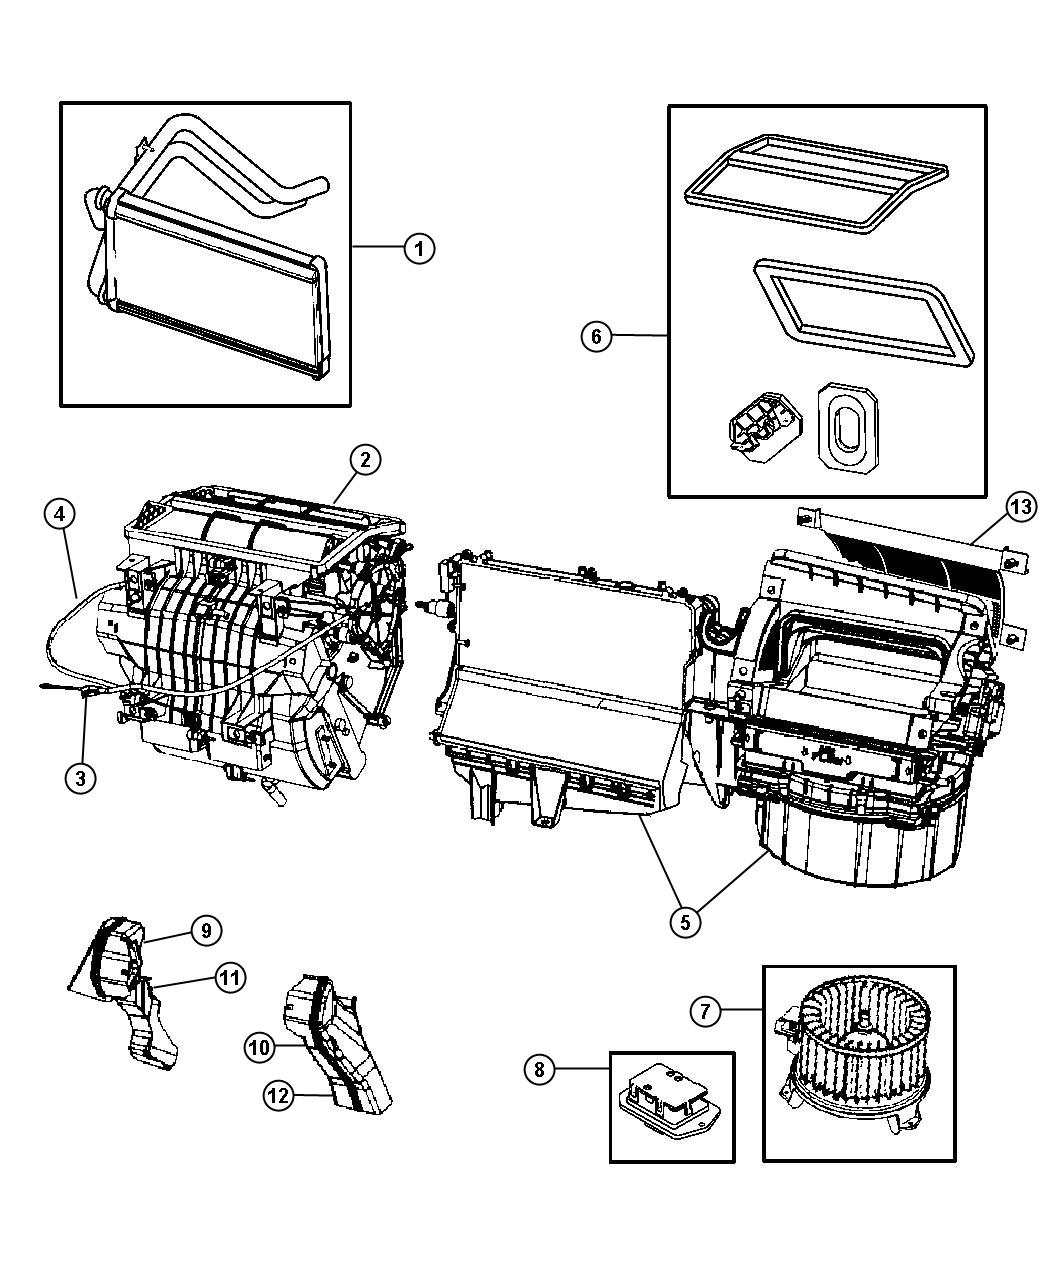 Jeep Compass Fuse Panel Diagram